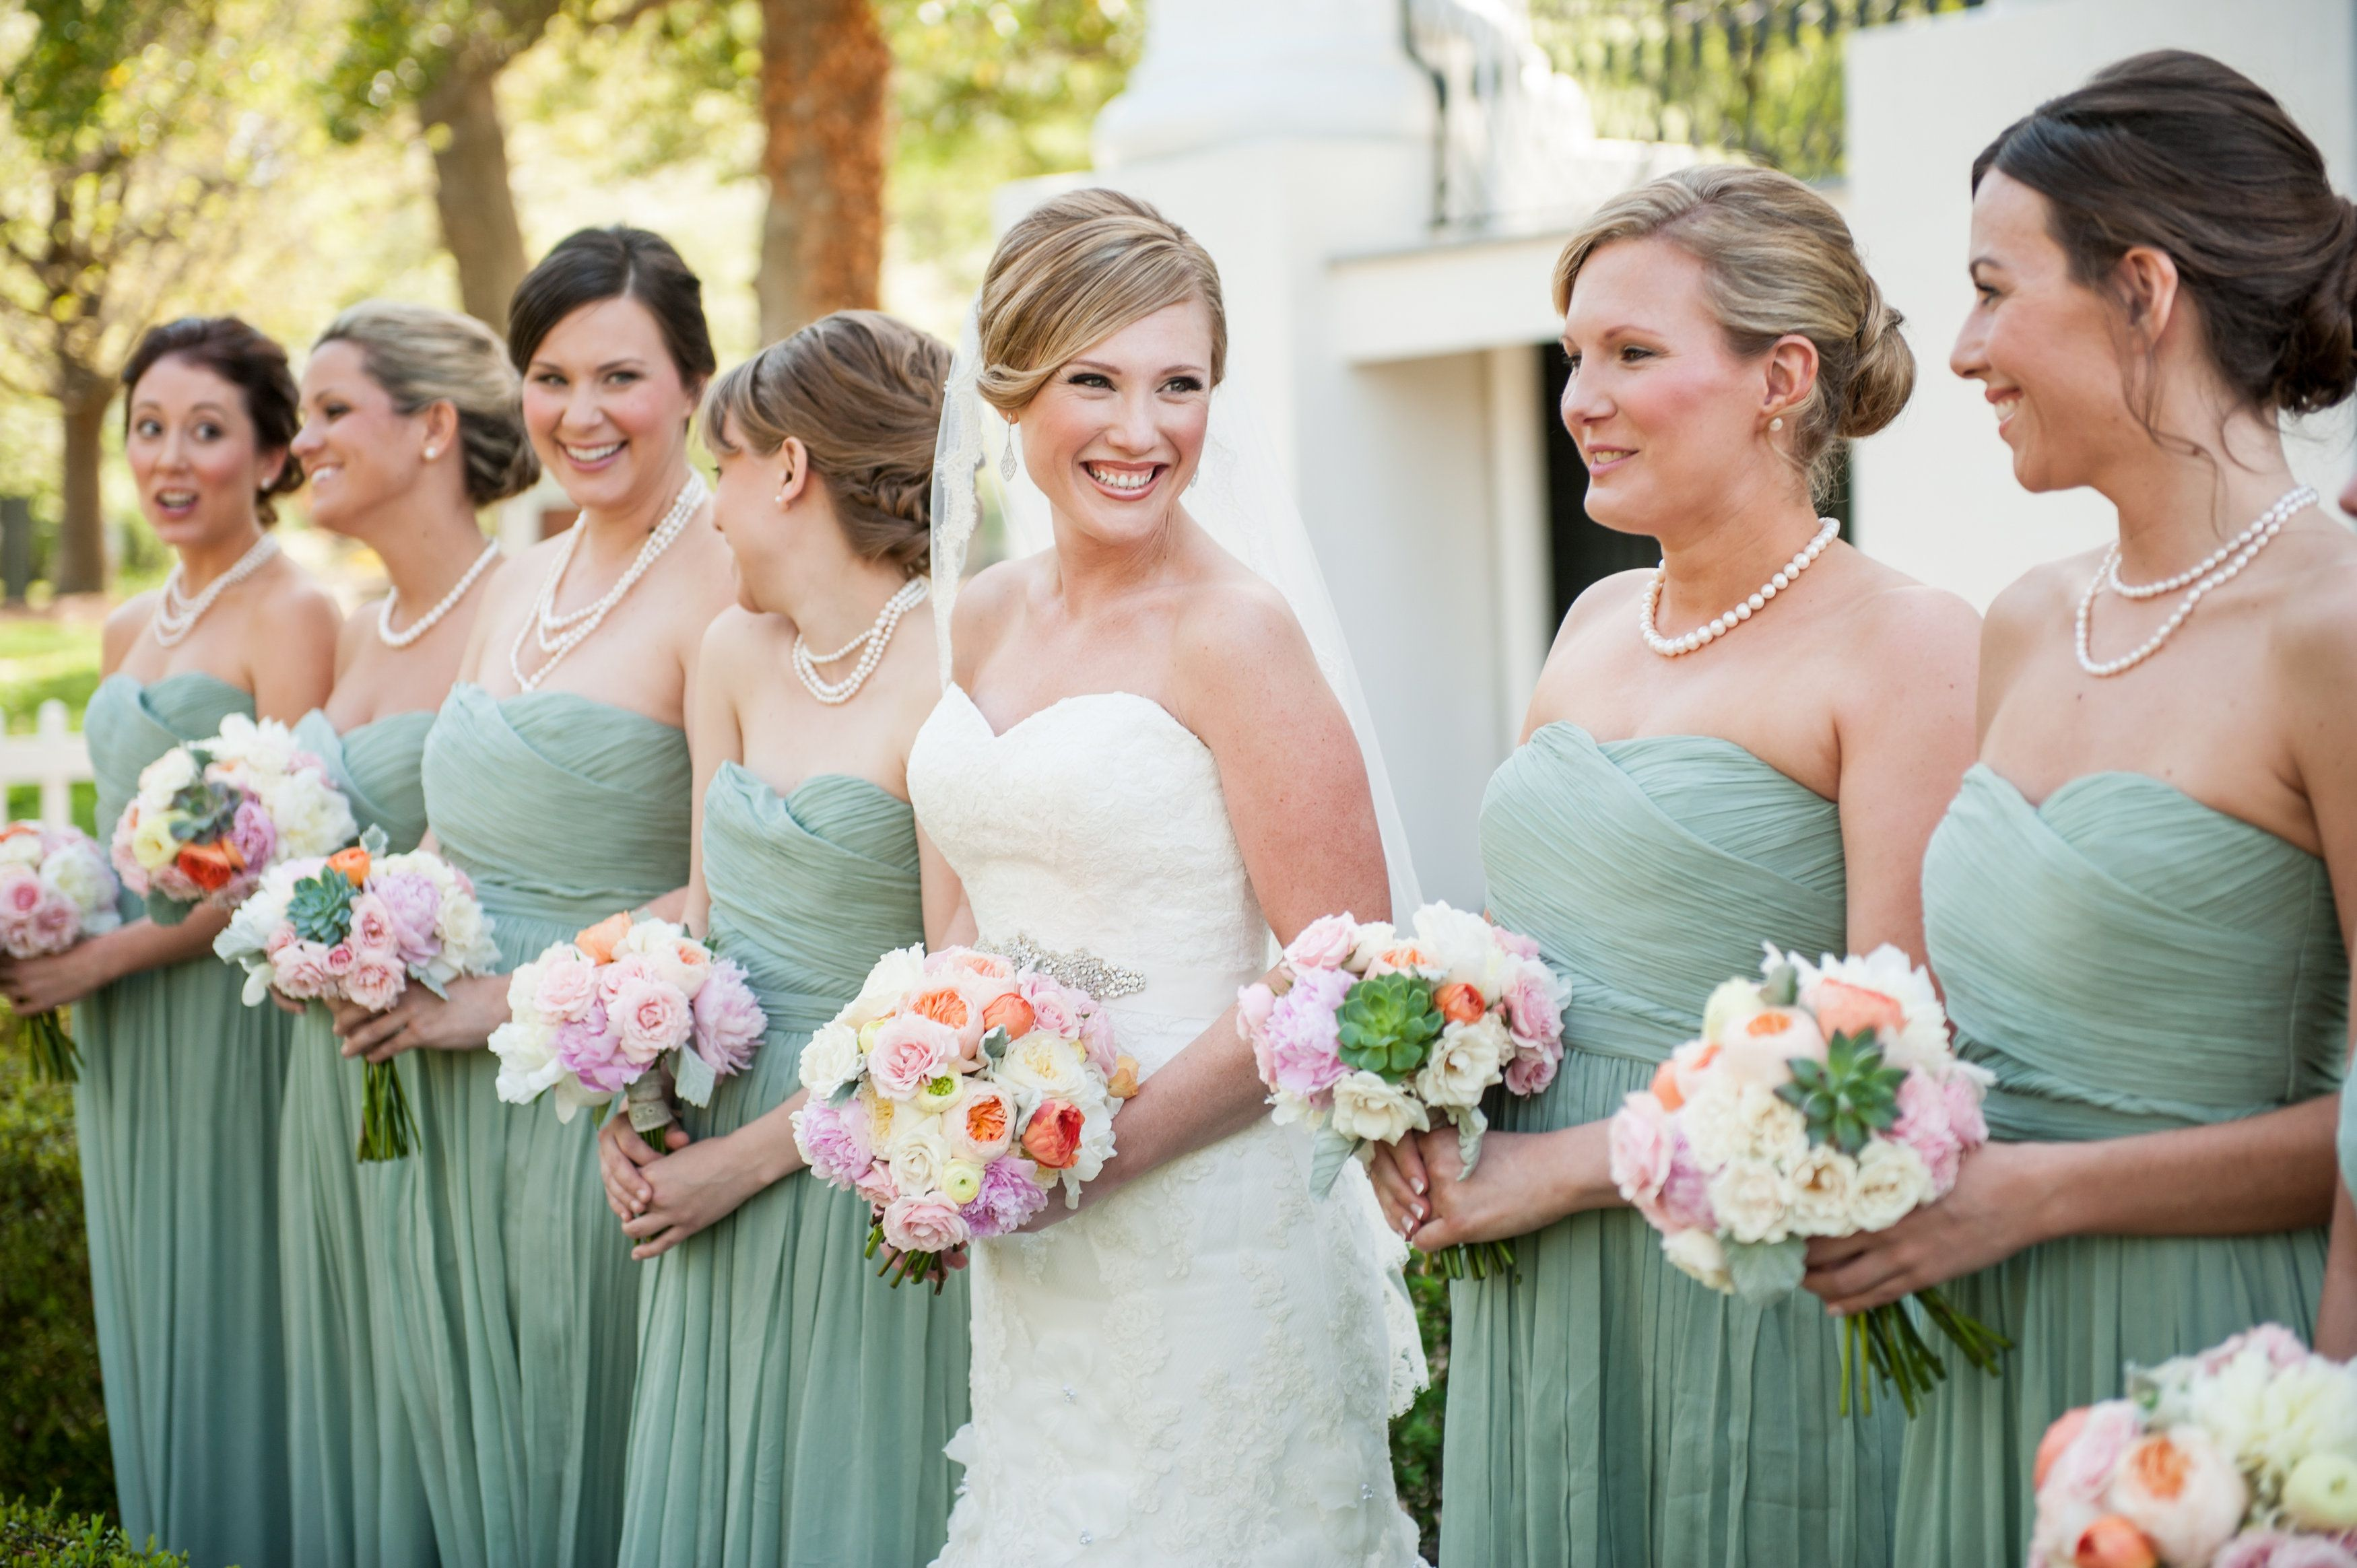 Christmas wedding dress jcrew - J Crew Dusty Shale Bridesmaid Dresses Peach Mint Wedding Celadon Dresses